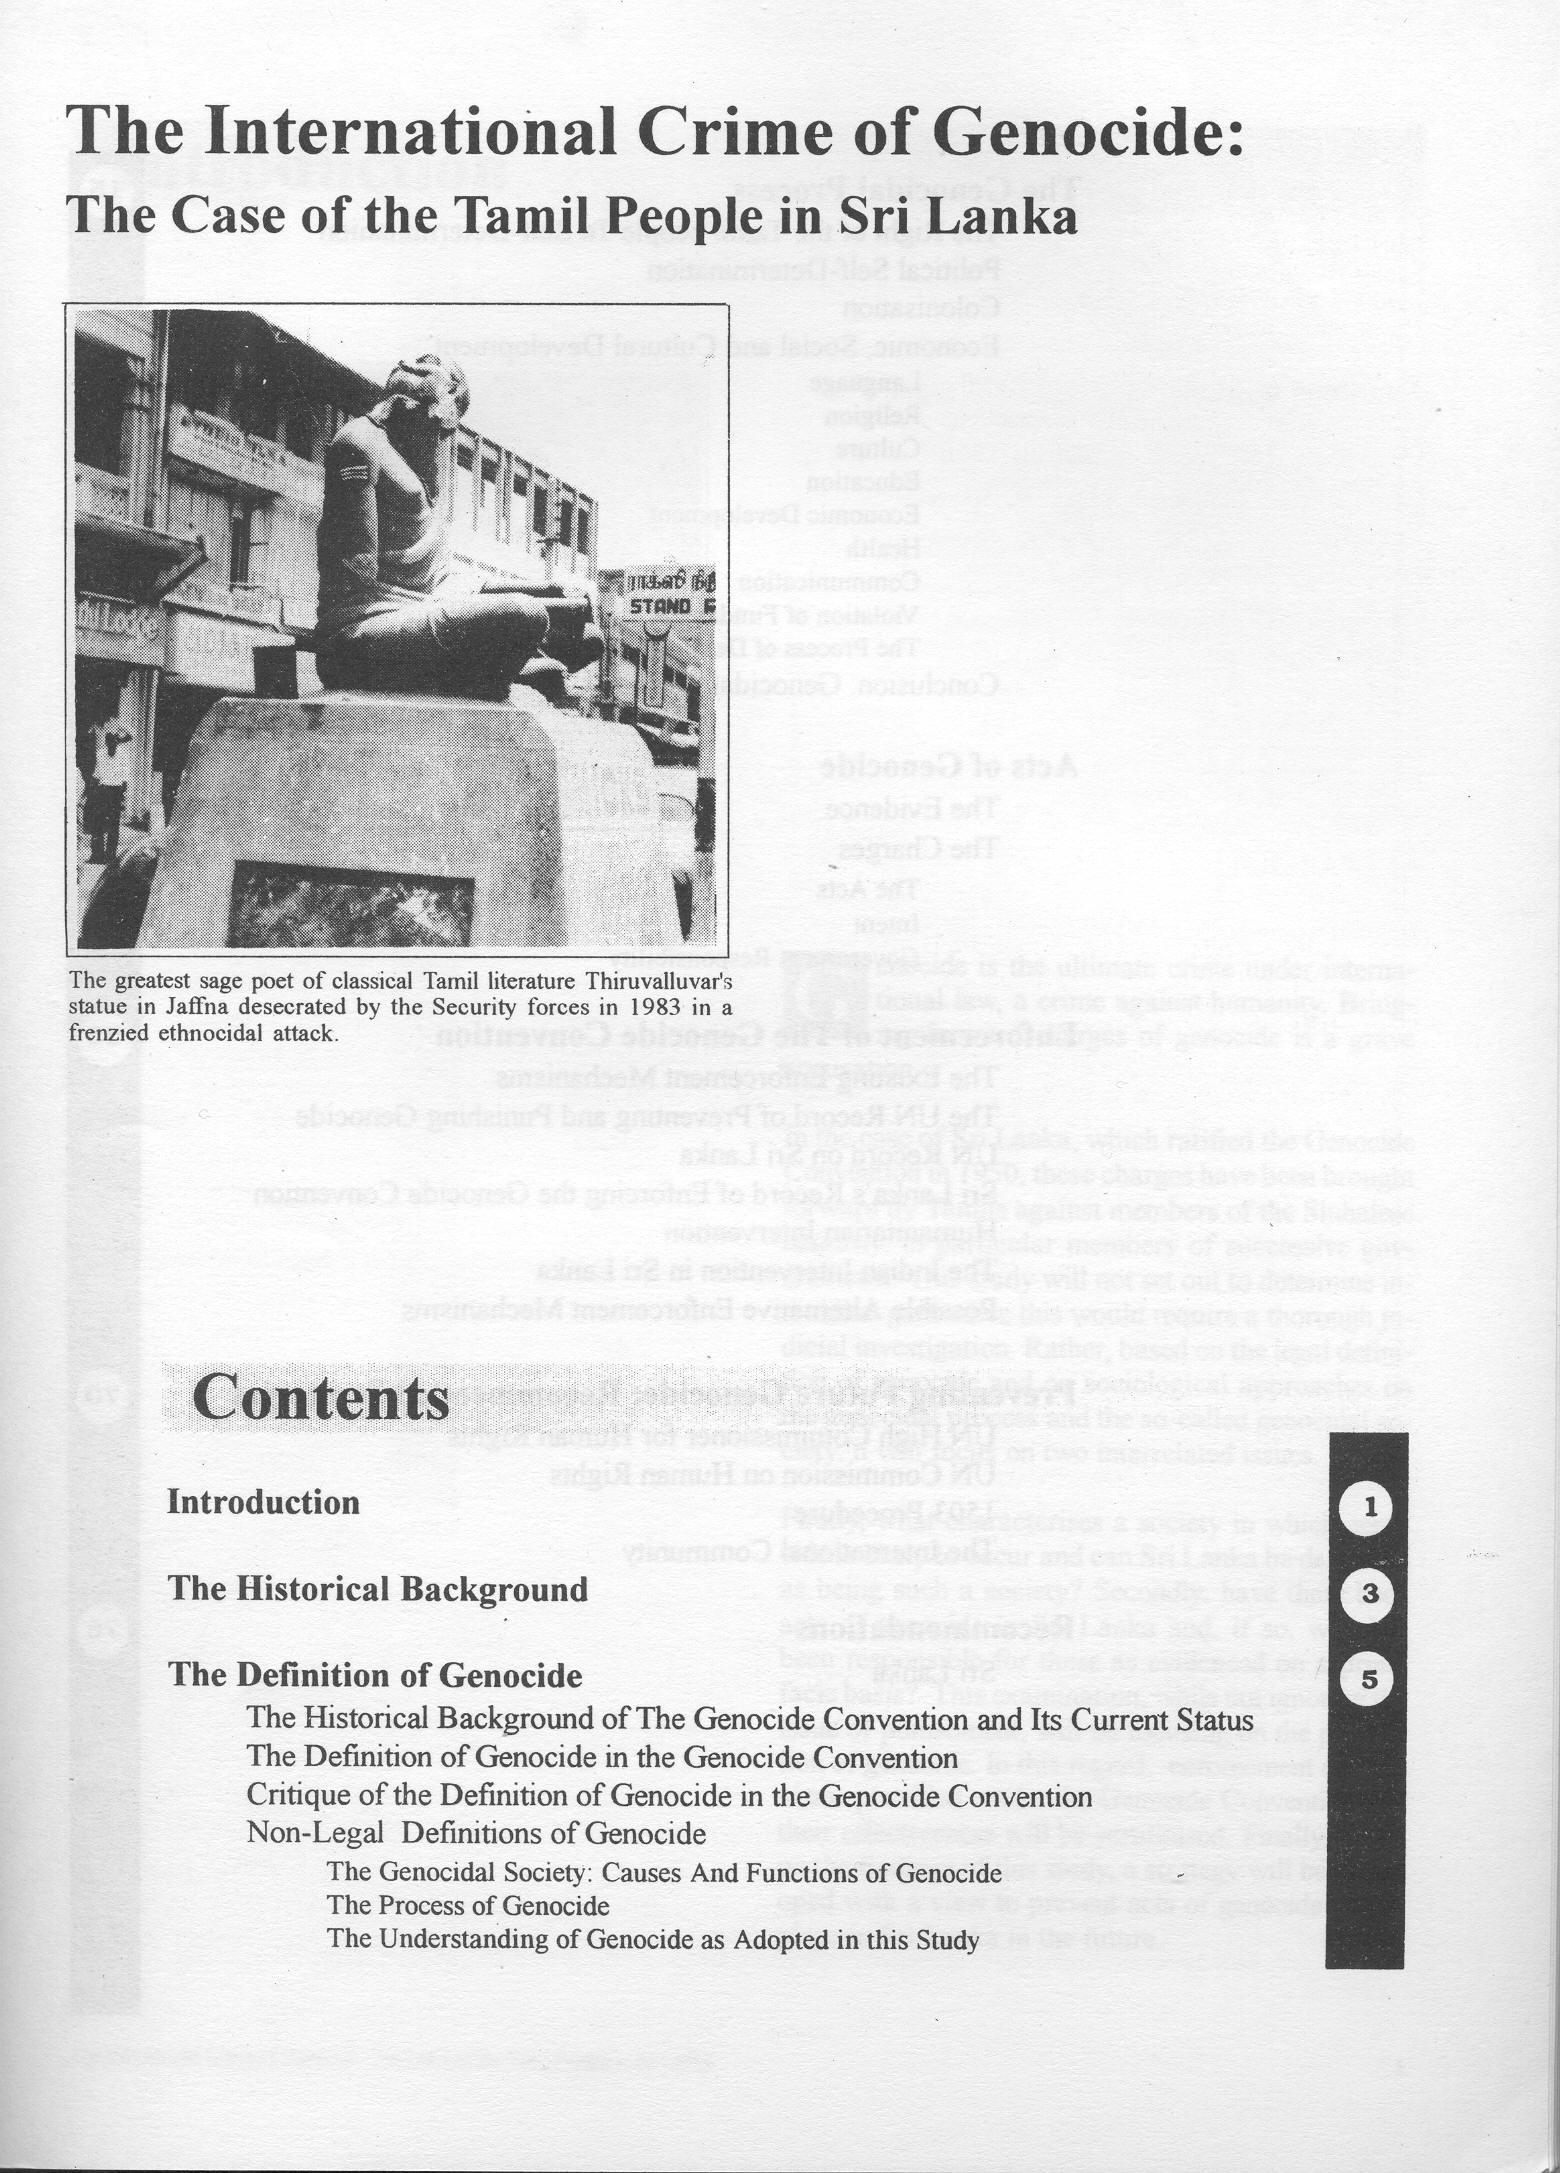 TIC Genocide of Tamils contents